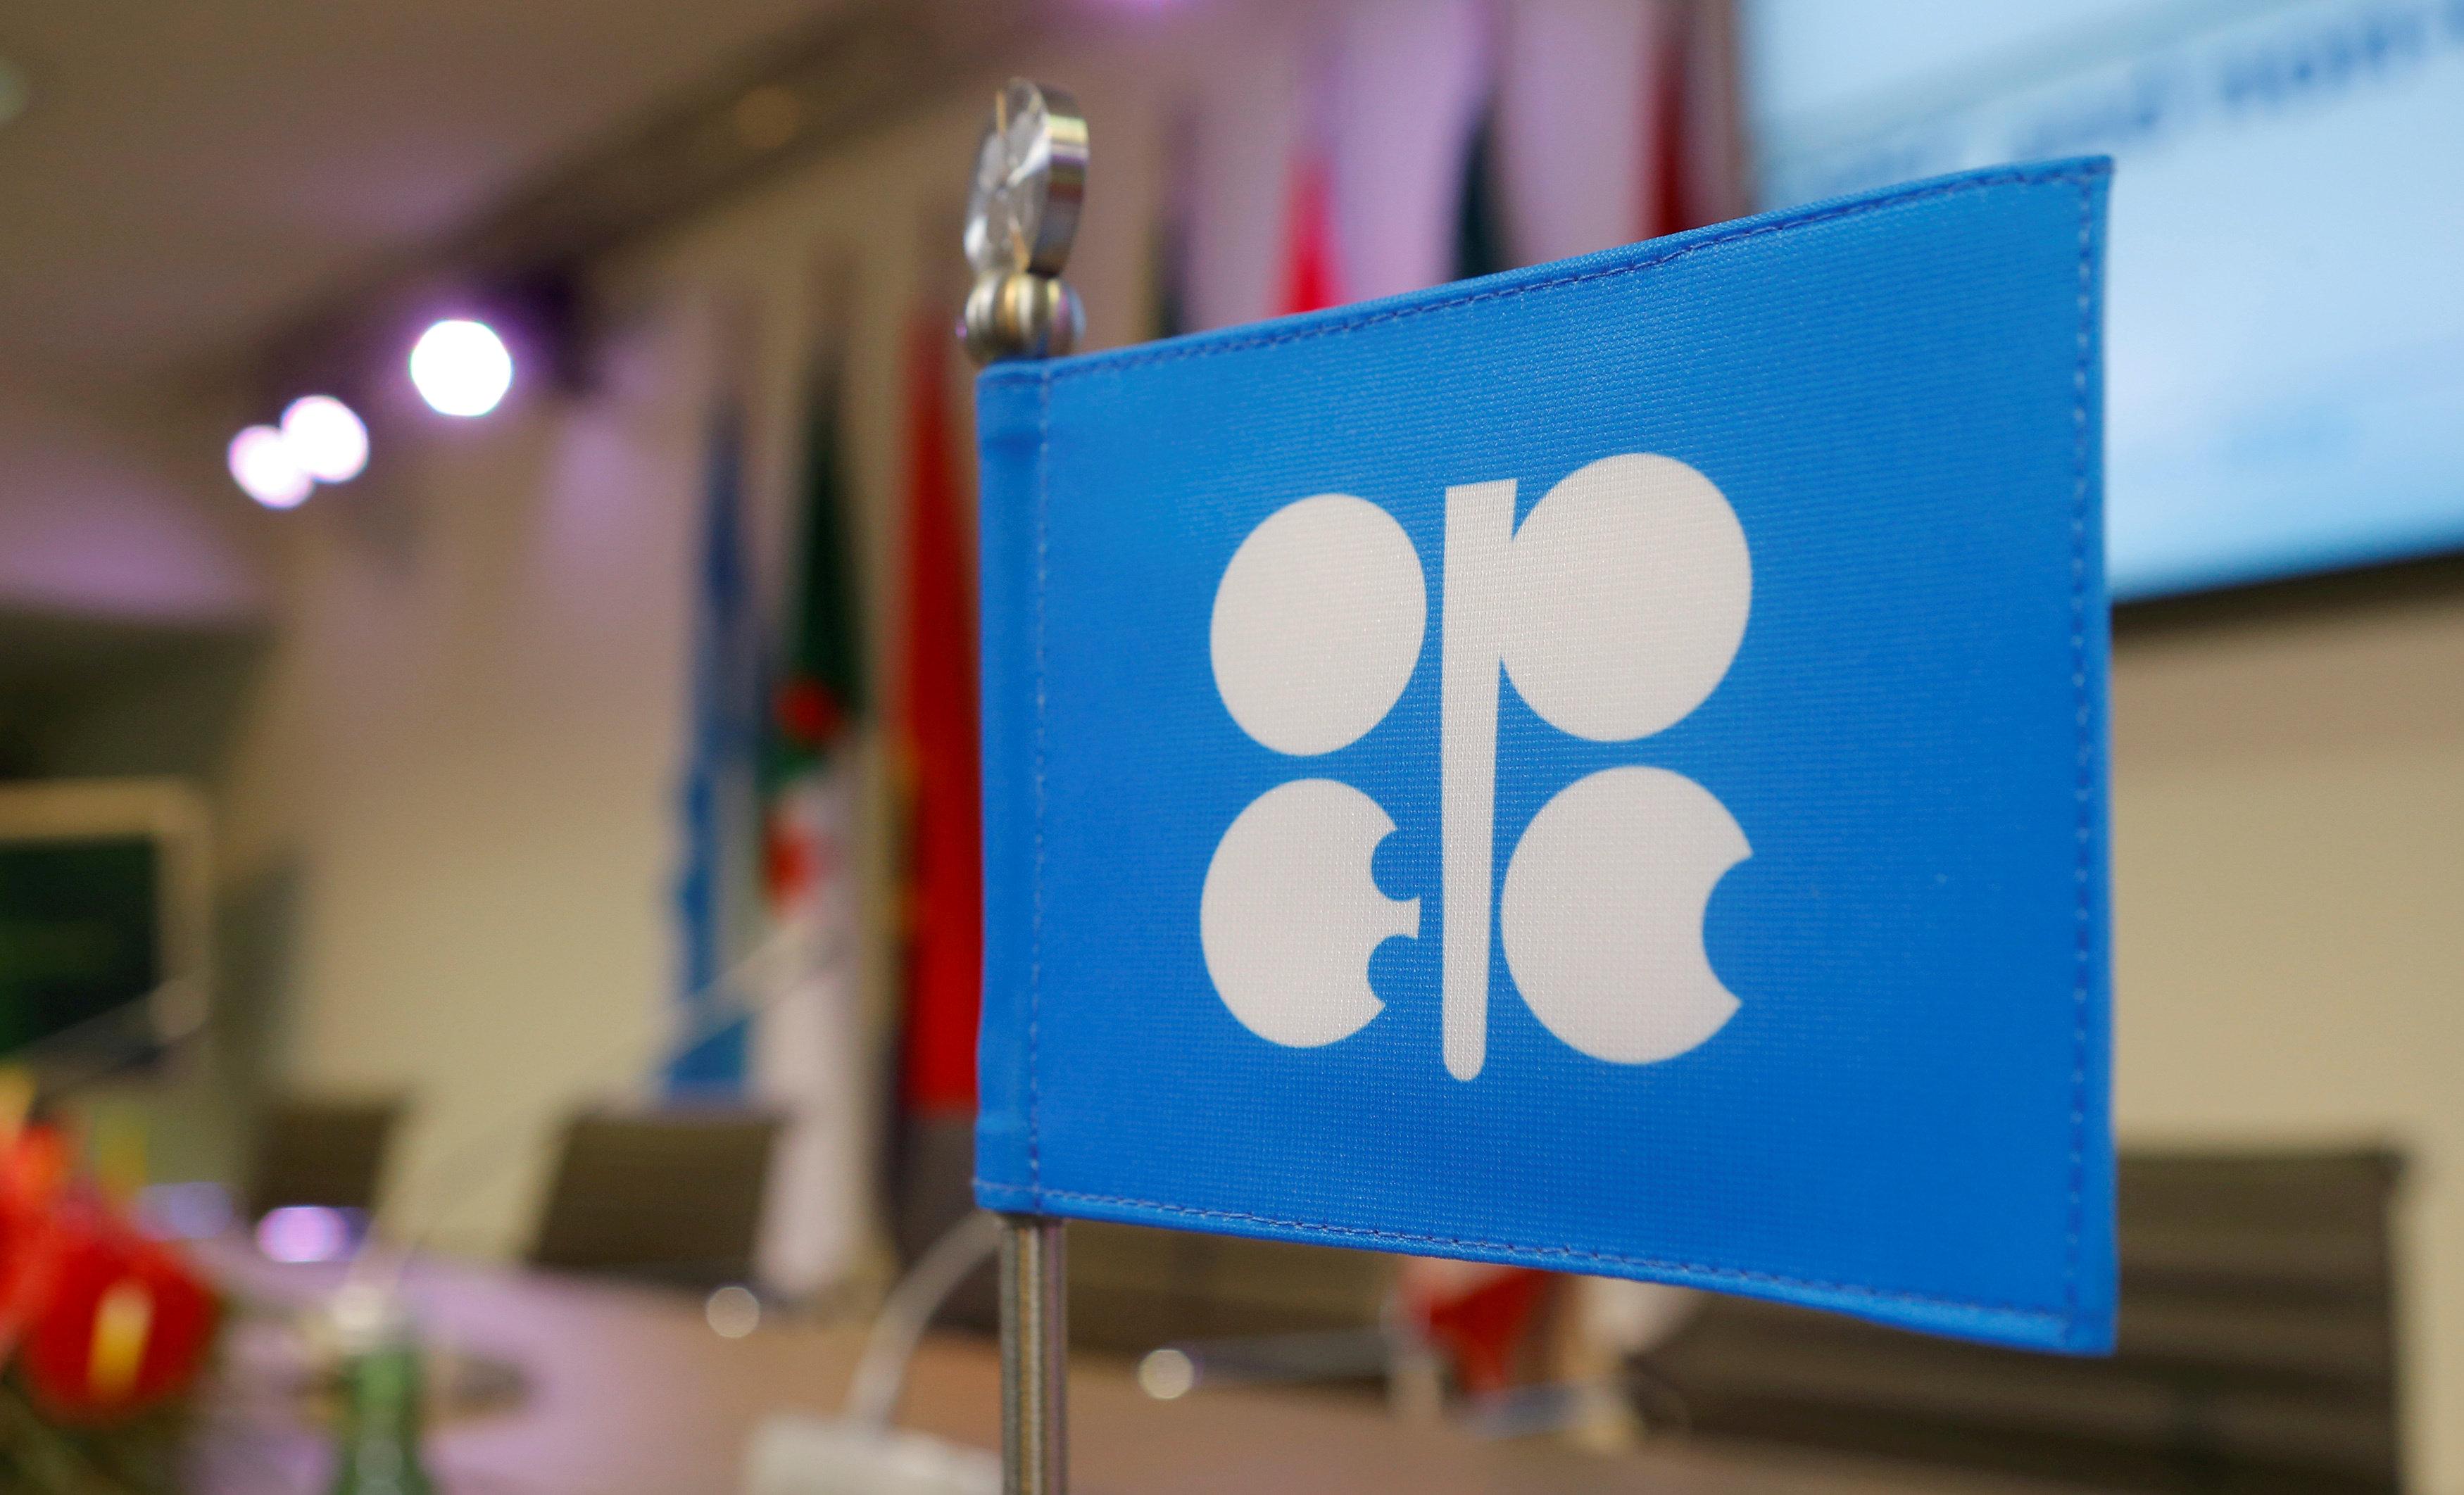 Saudi Arabia calls Opec members to stick to limits, sees oil demand up